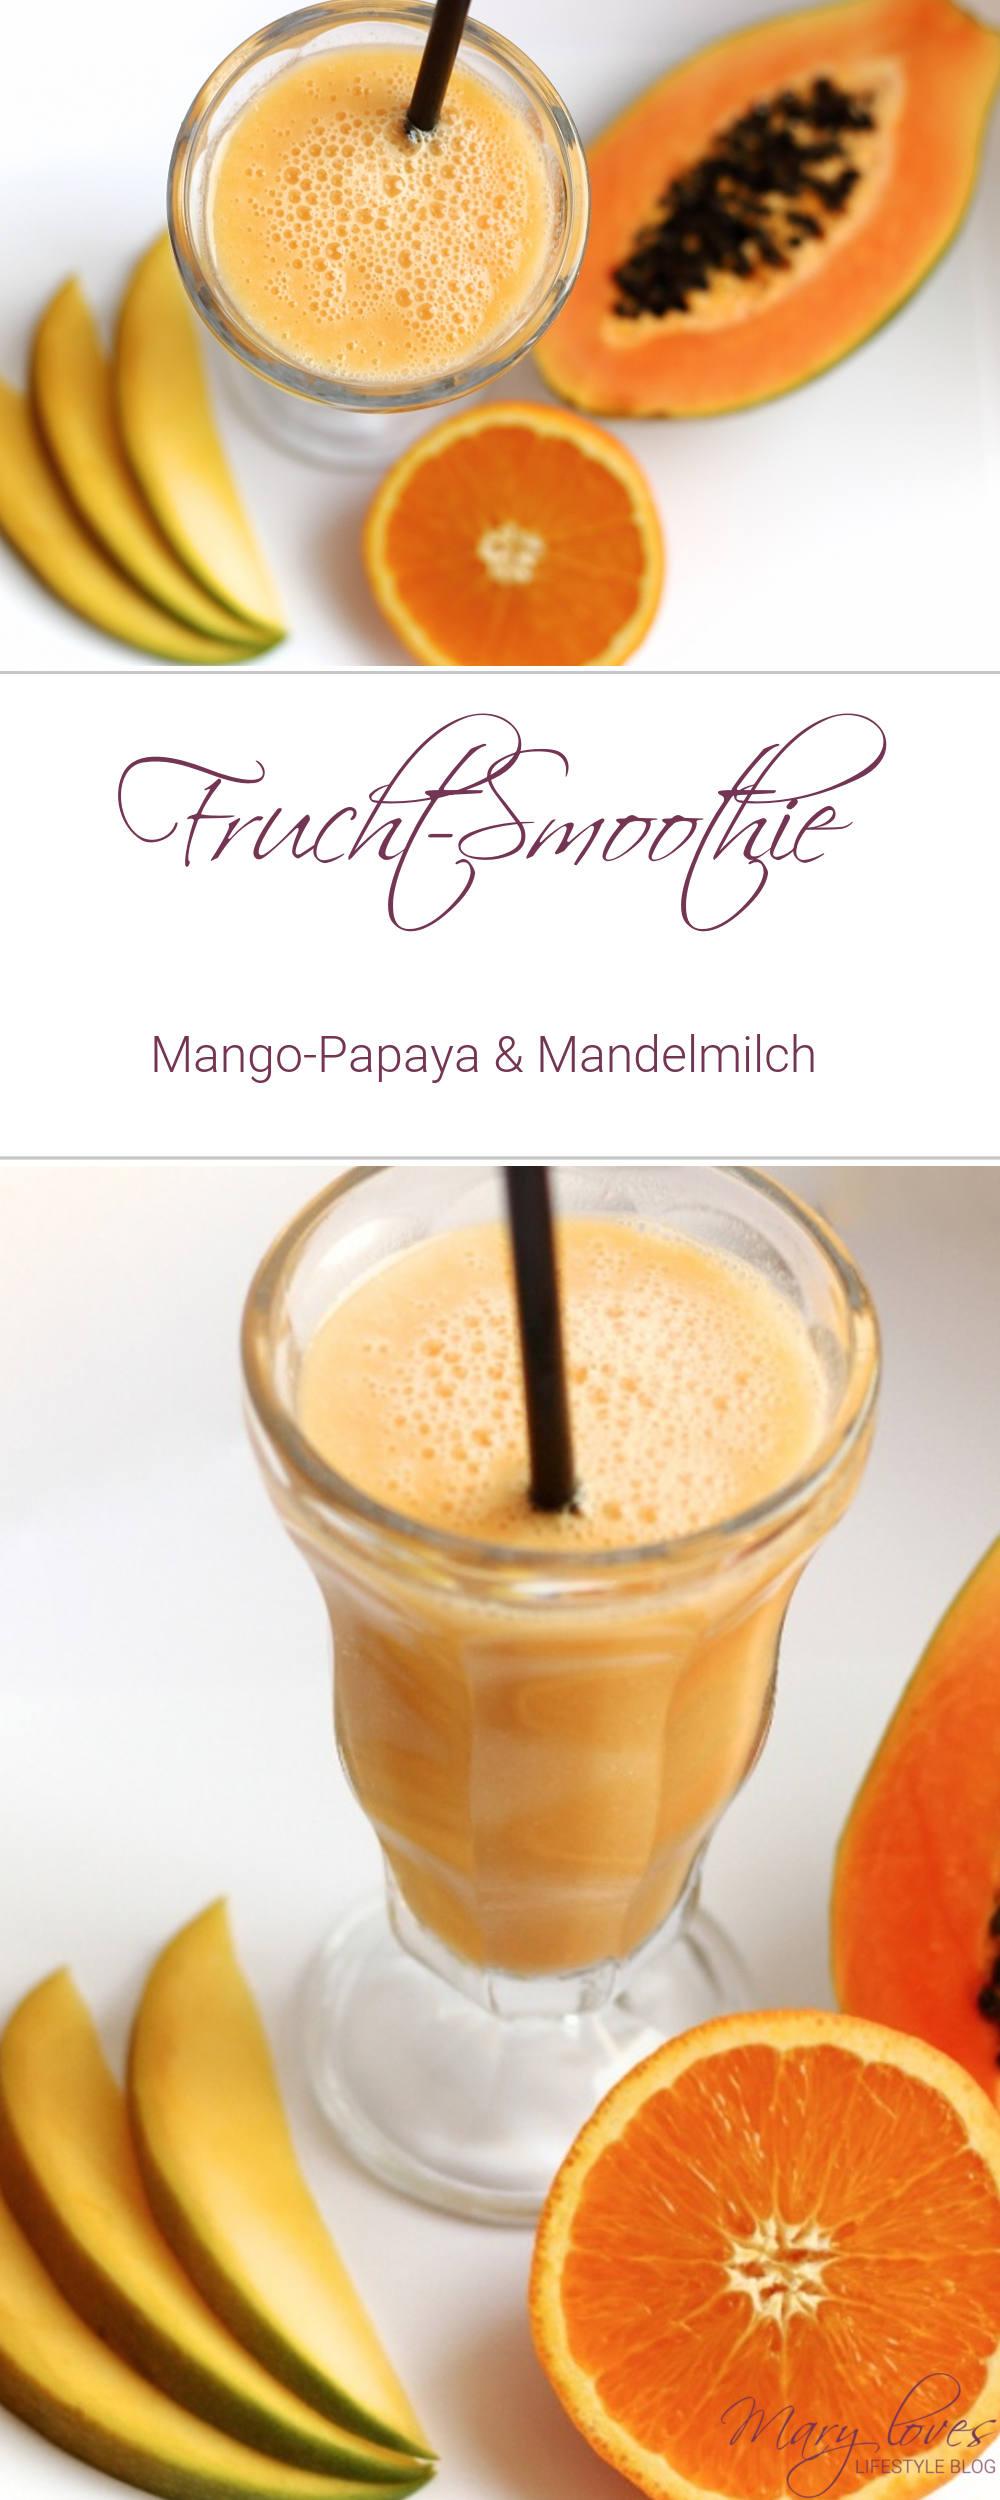 smoothie rezept frucht smoothie mit mandelmilch mary loves. Black Bedroom Furniture Sets. Home Design Ideas